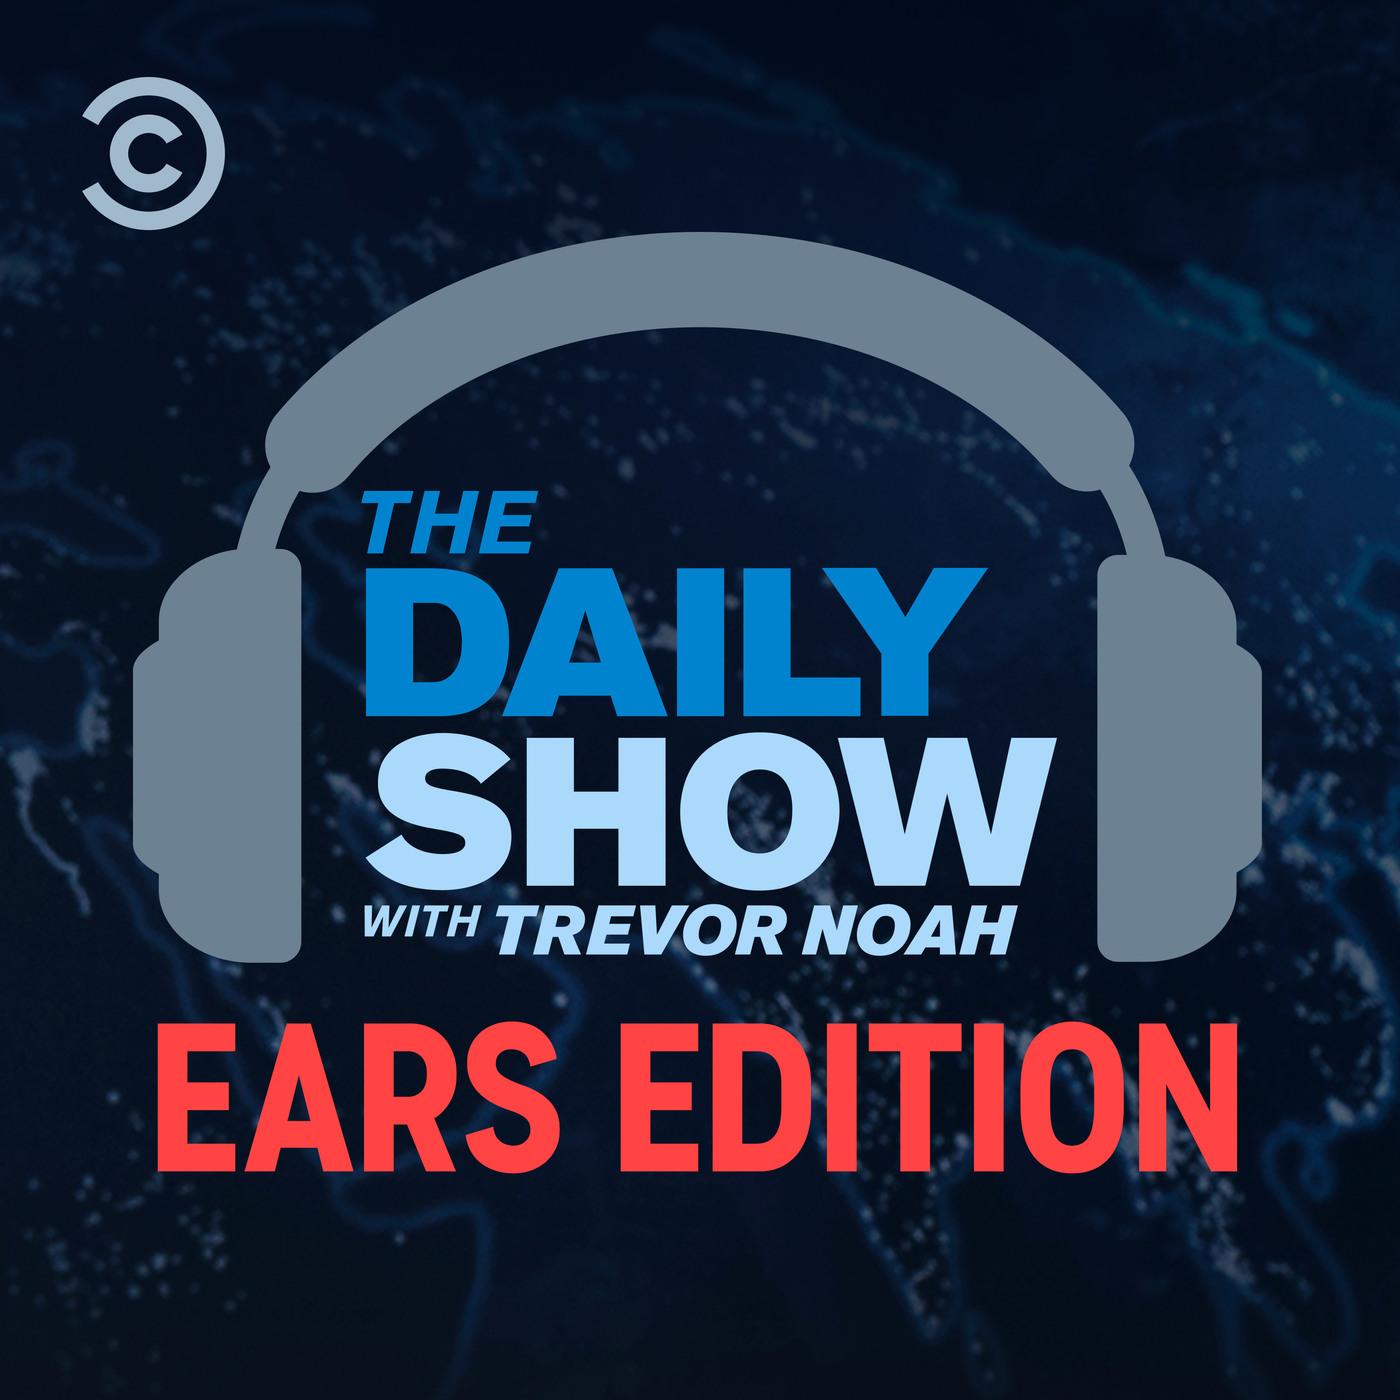 The Daily Show With Trevor Noah: Ears Edition